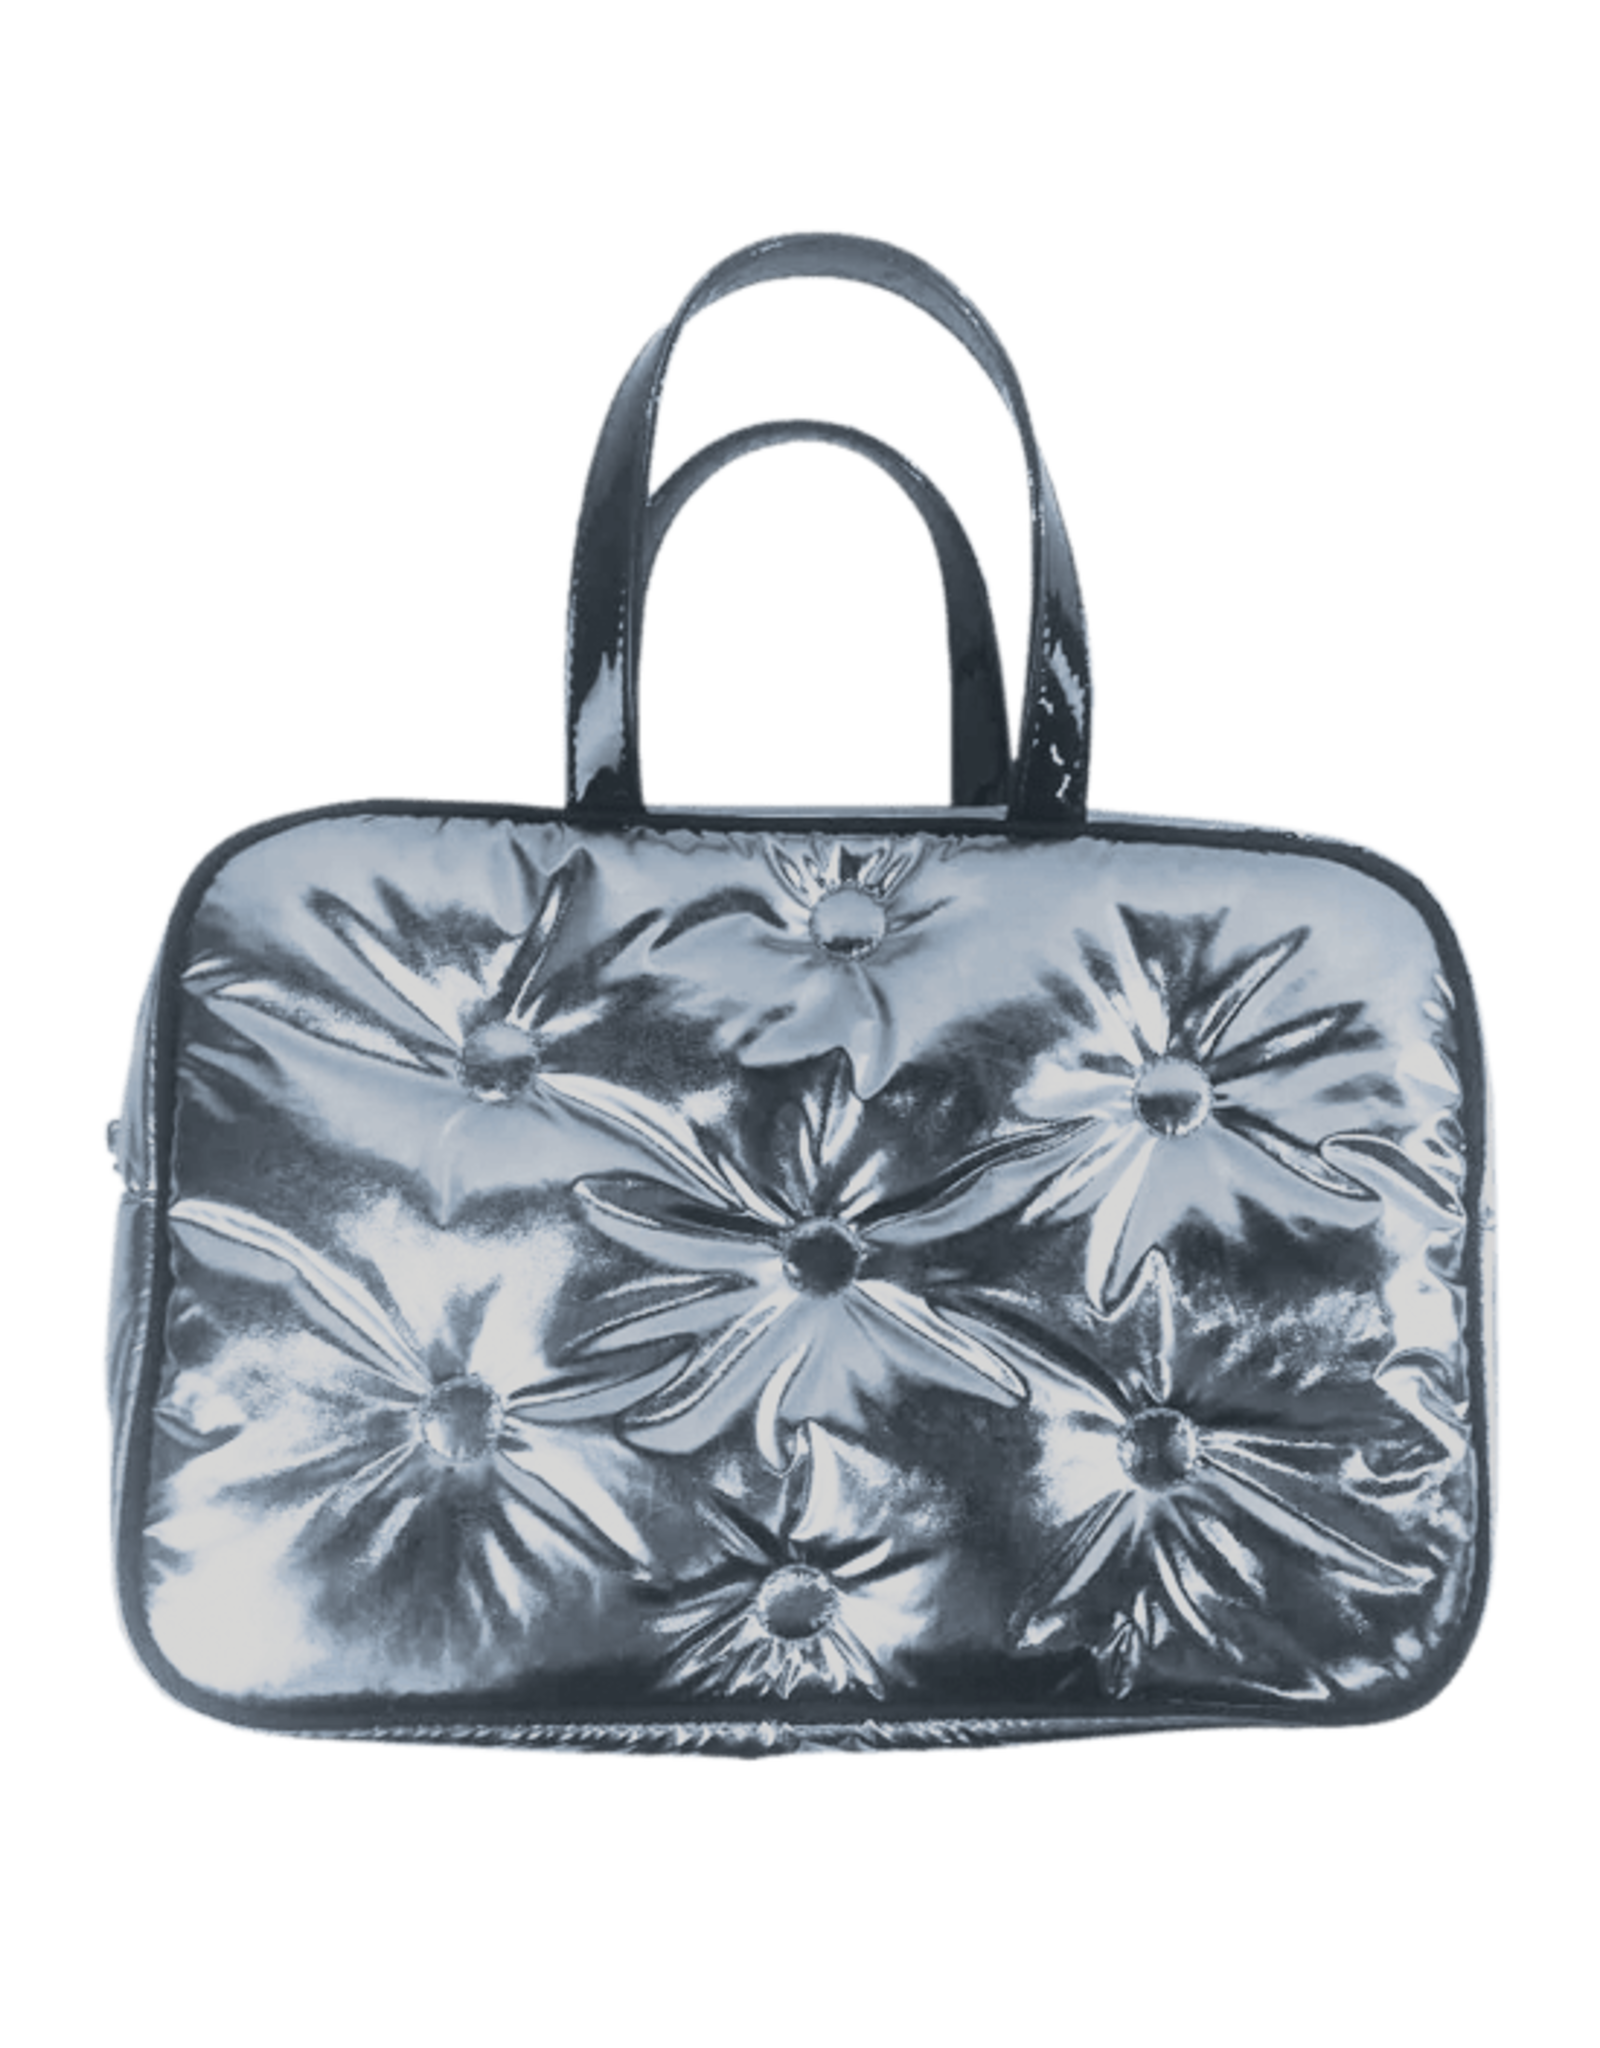 Iscream Cosmetic Bag, Chrome Metallic Tufted, Large